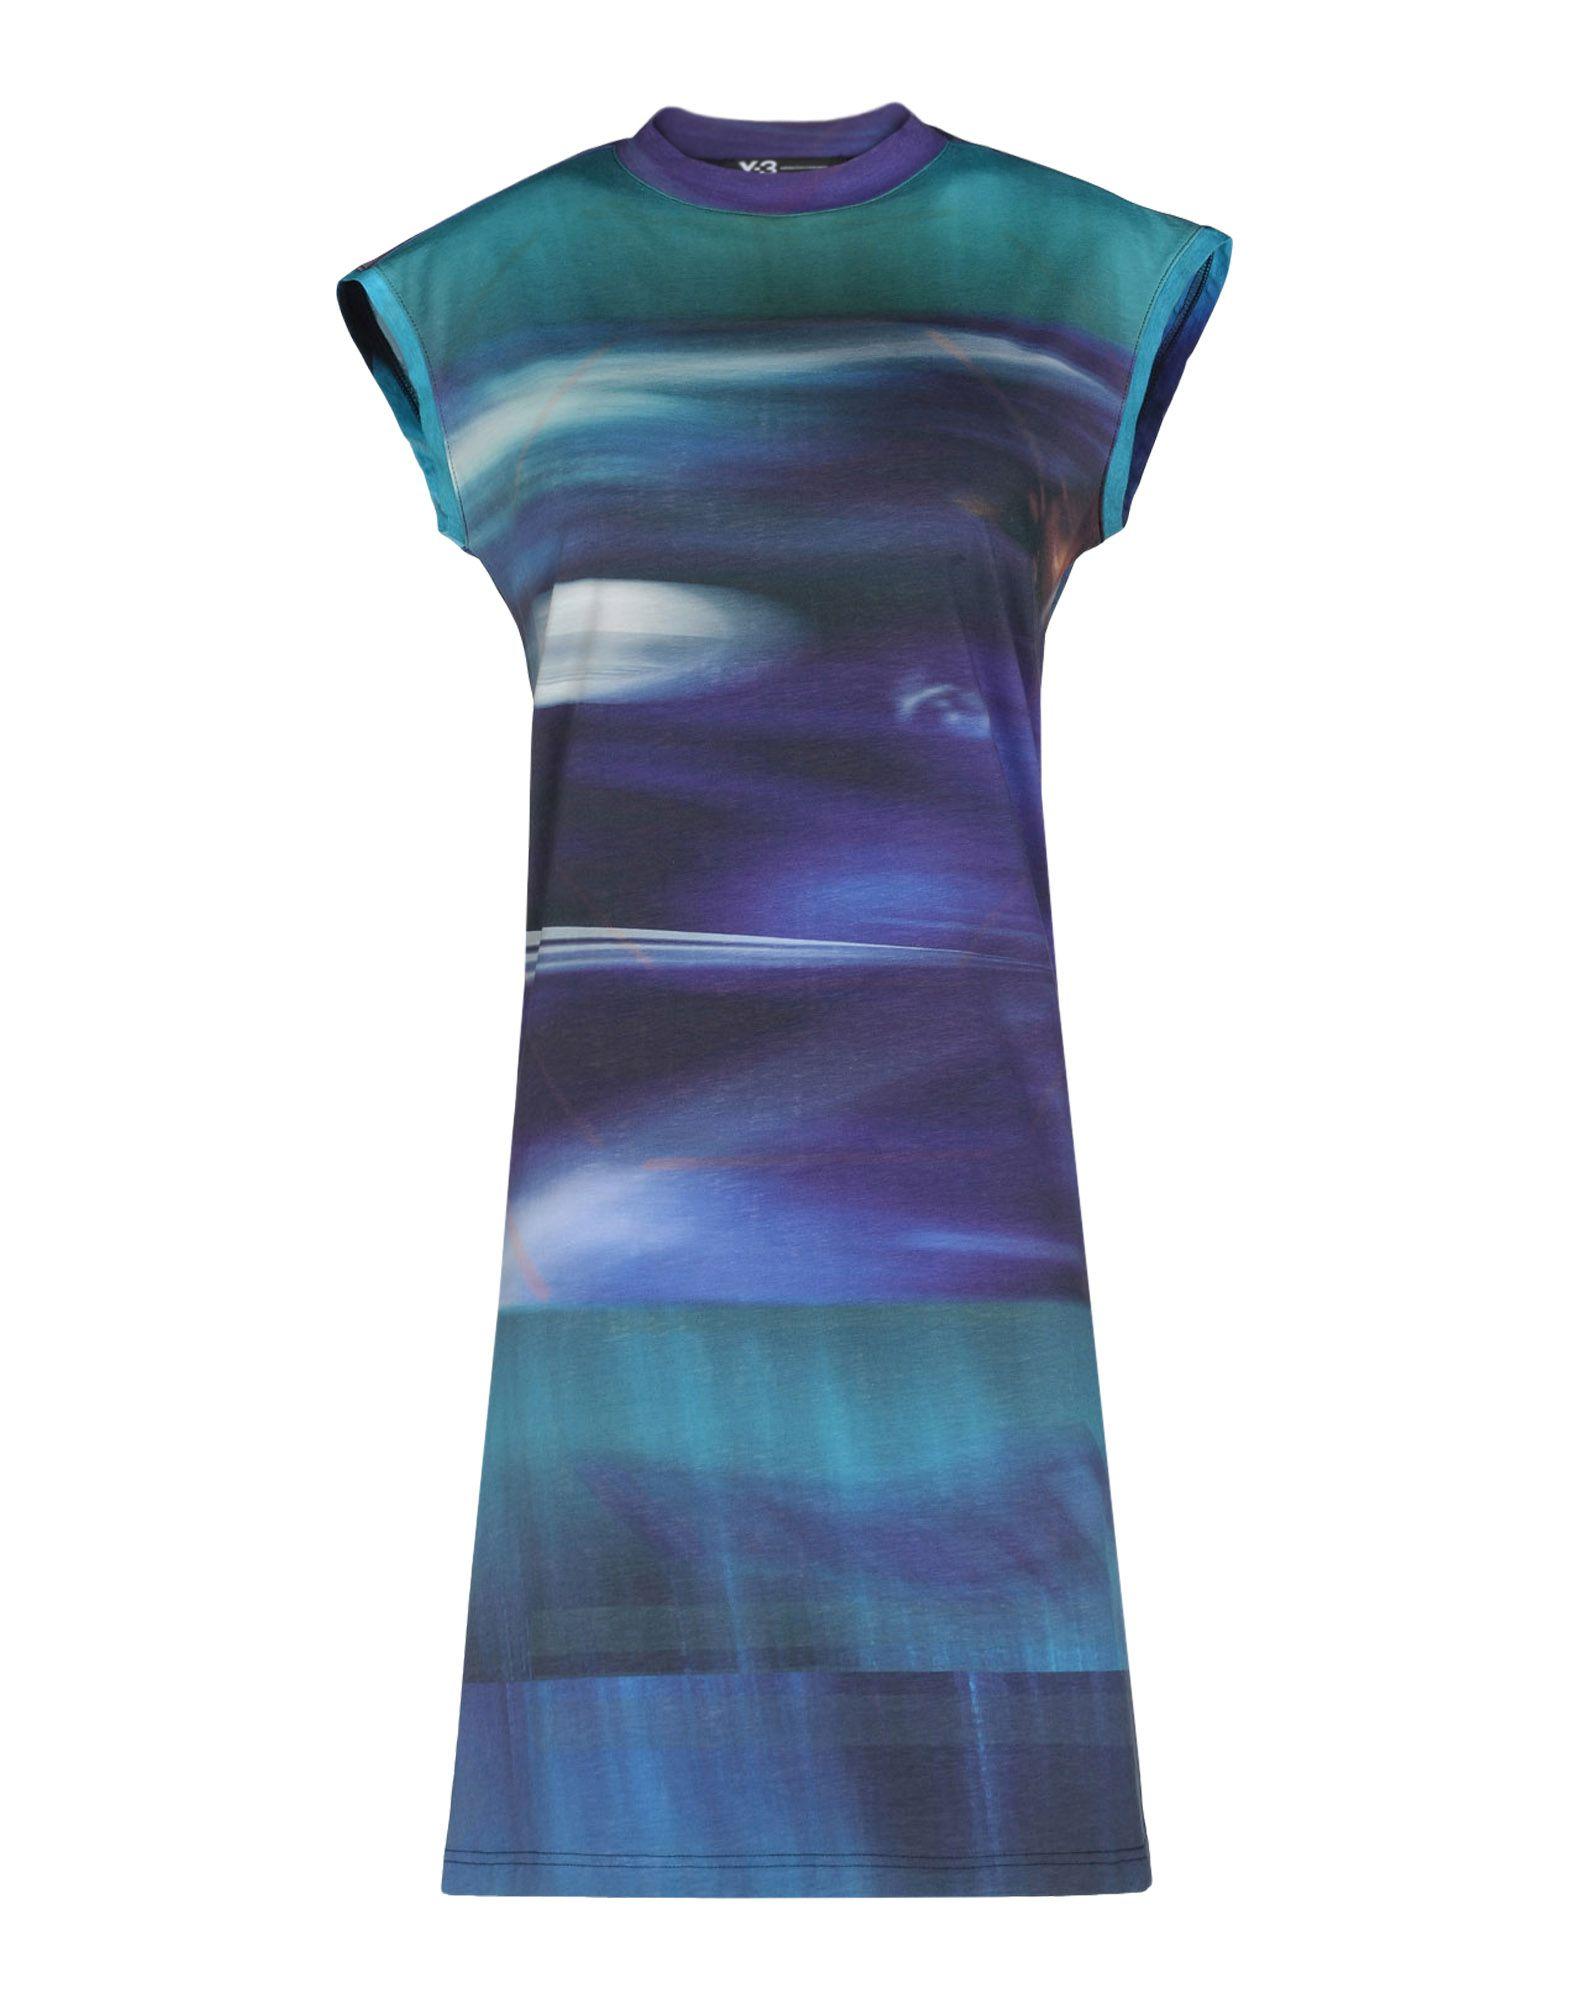 Y-3 Короткое платье юбка для девочки yb10545 разноцветный y clu